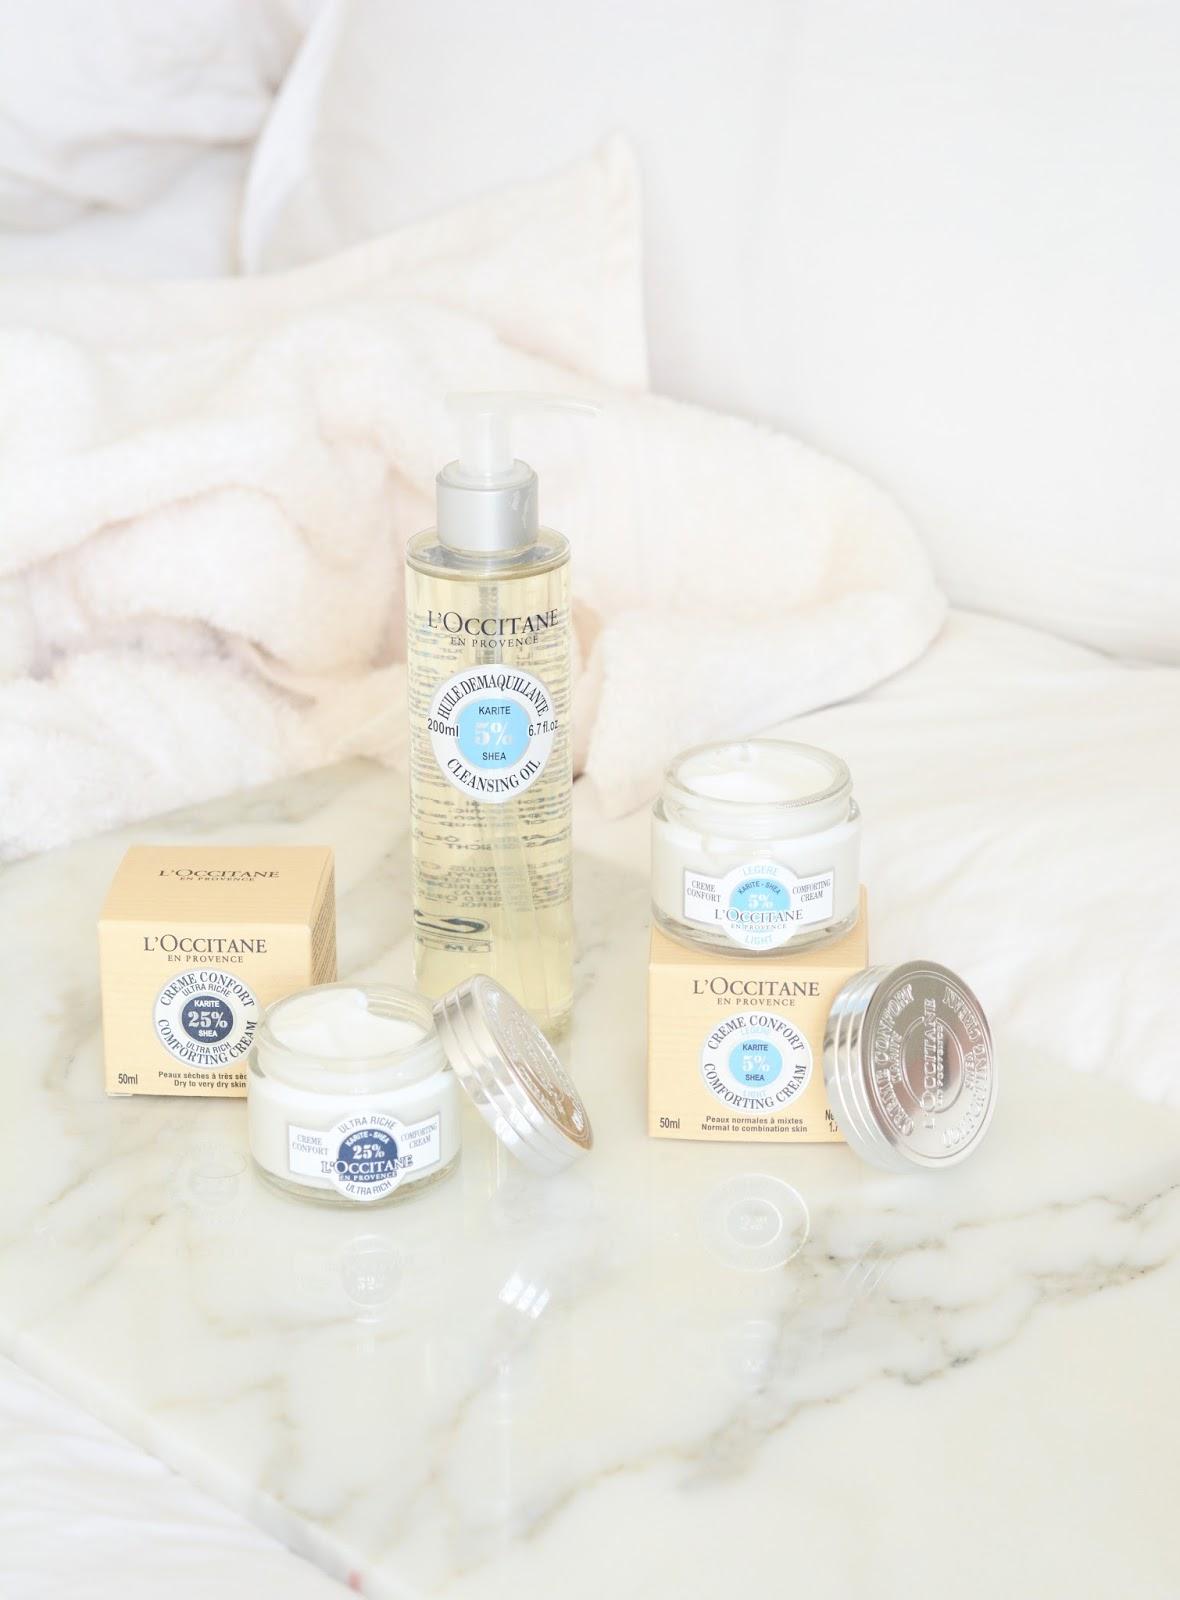 L'Occitane Shea Cleansing Oil Light Ultra Rich Comfort Cream Review Photos